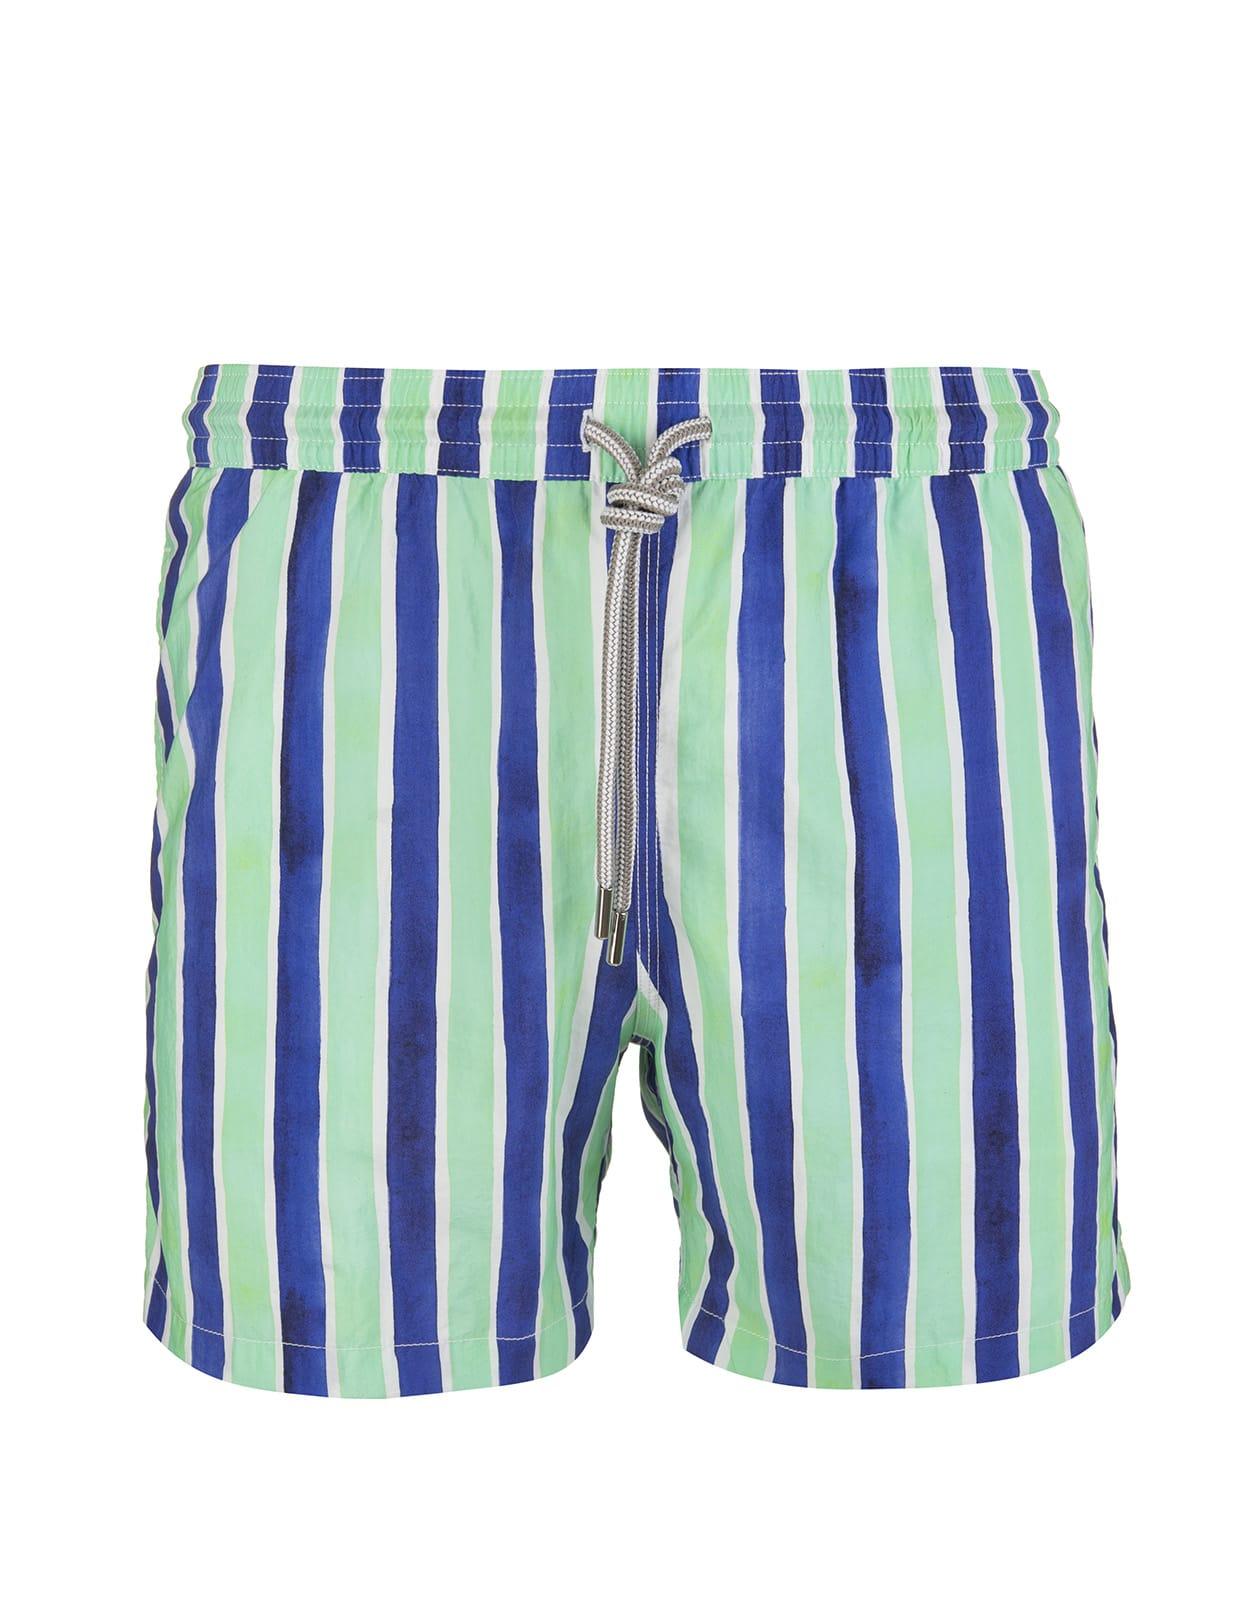 Blue And Aquamarine Striped Swimsuit